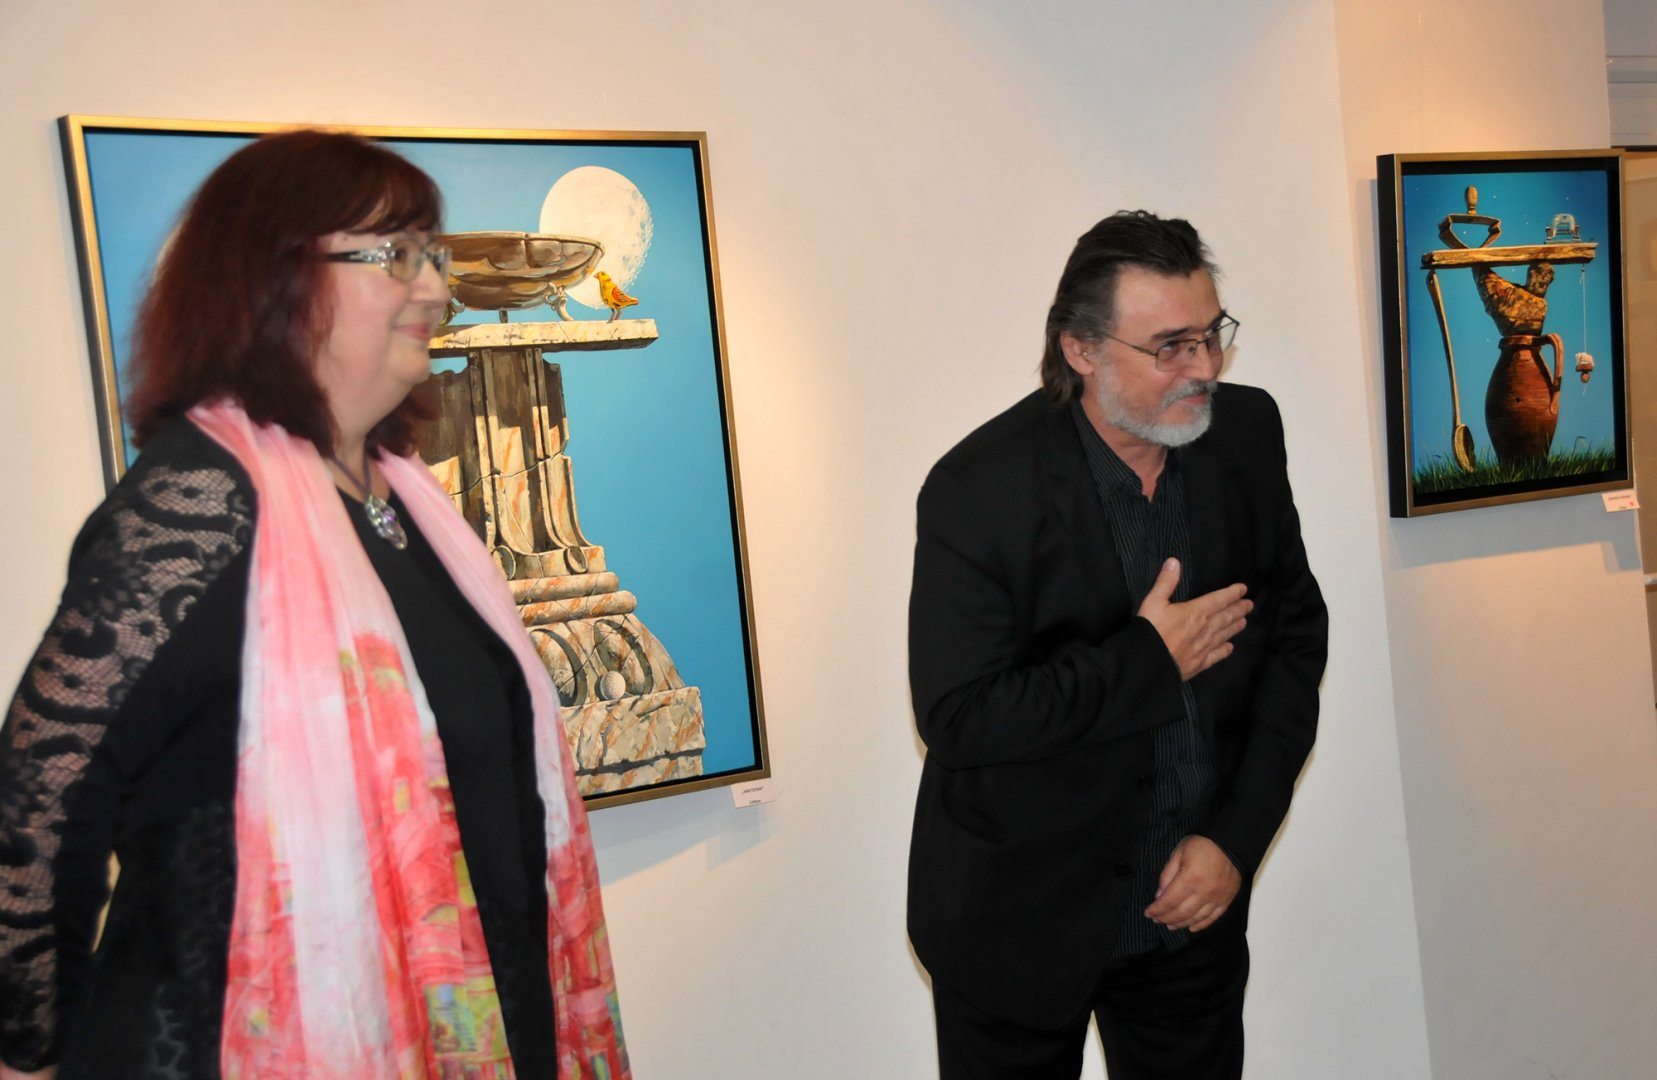 Доц. Борис Желев благодари на бургазлии за топлото посрещане в галерия Бургас. Снимки Лина Главинова